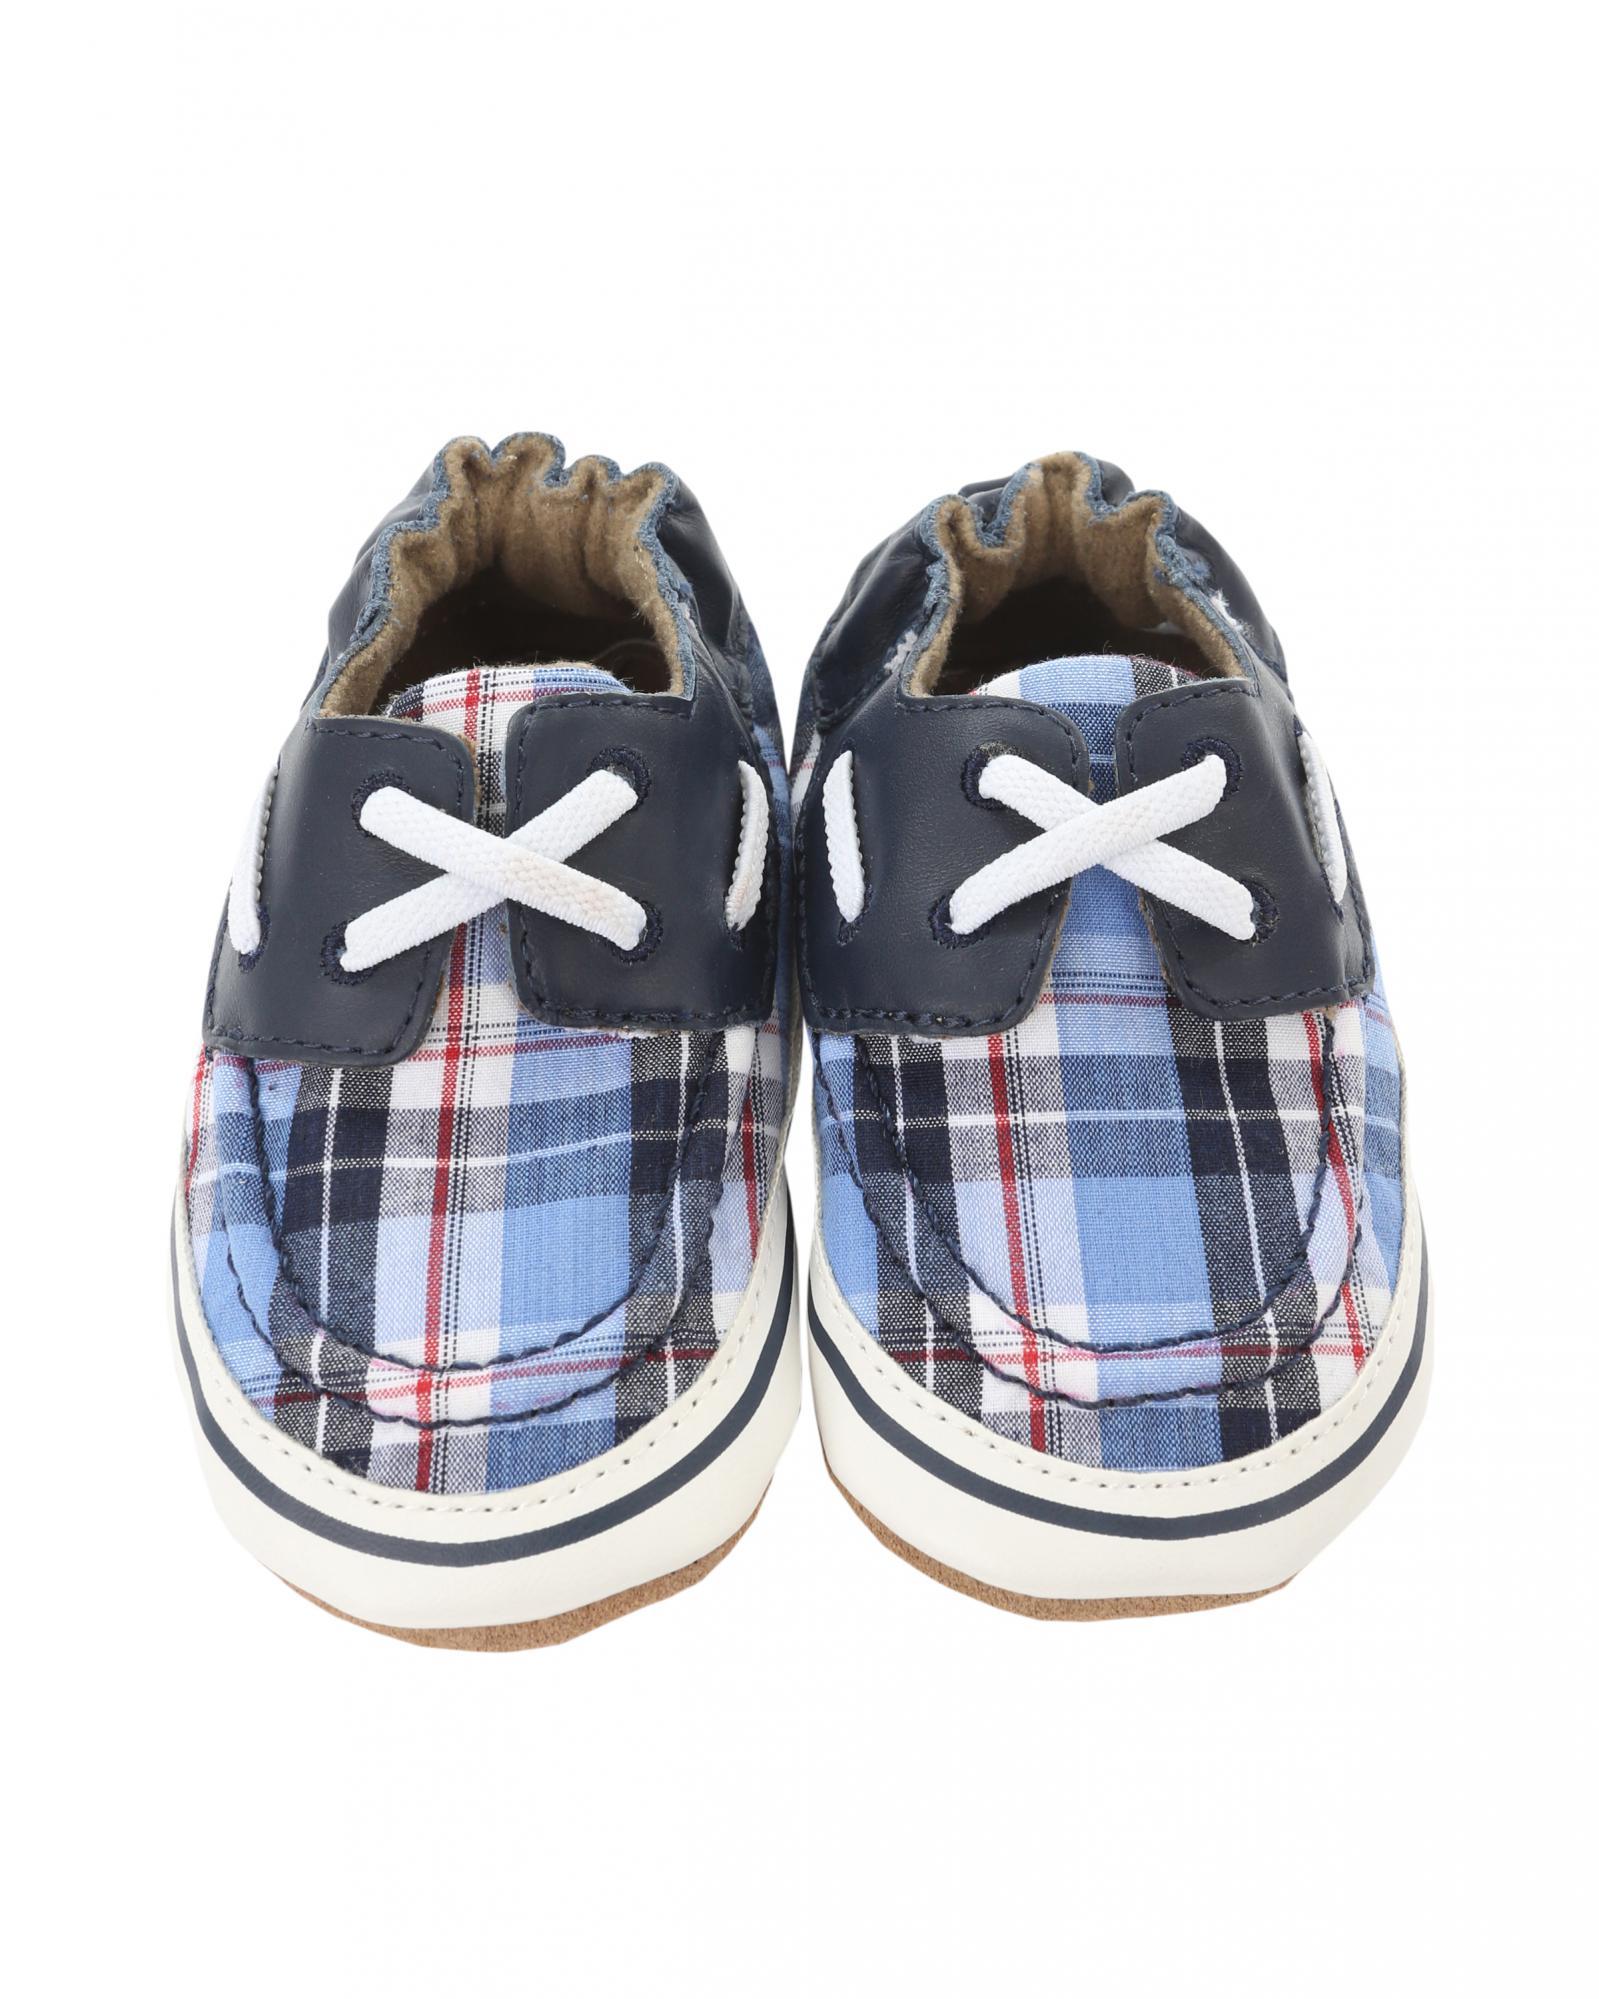 robeez-soft-sole-baby-shoes-connor-blue-plaid.jpg